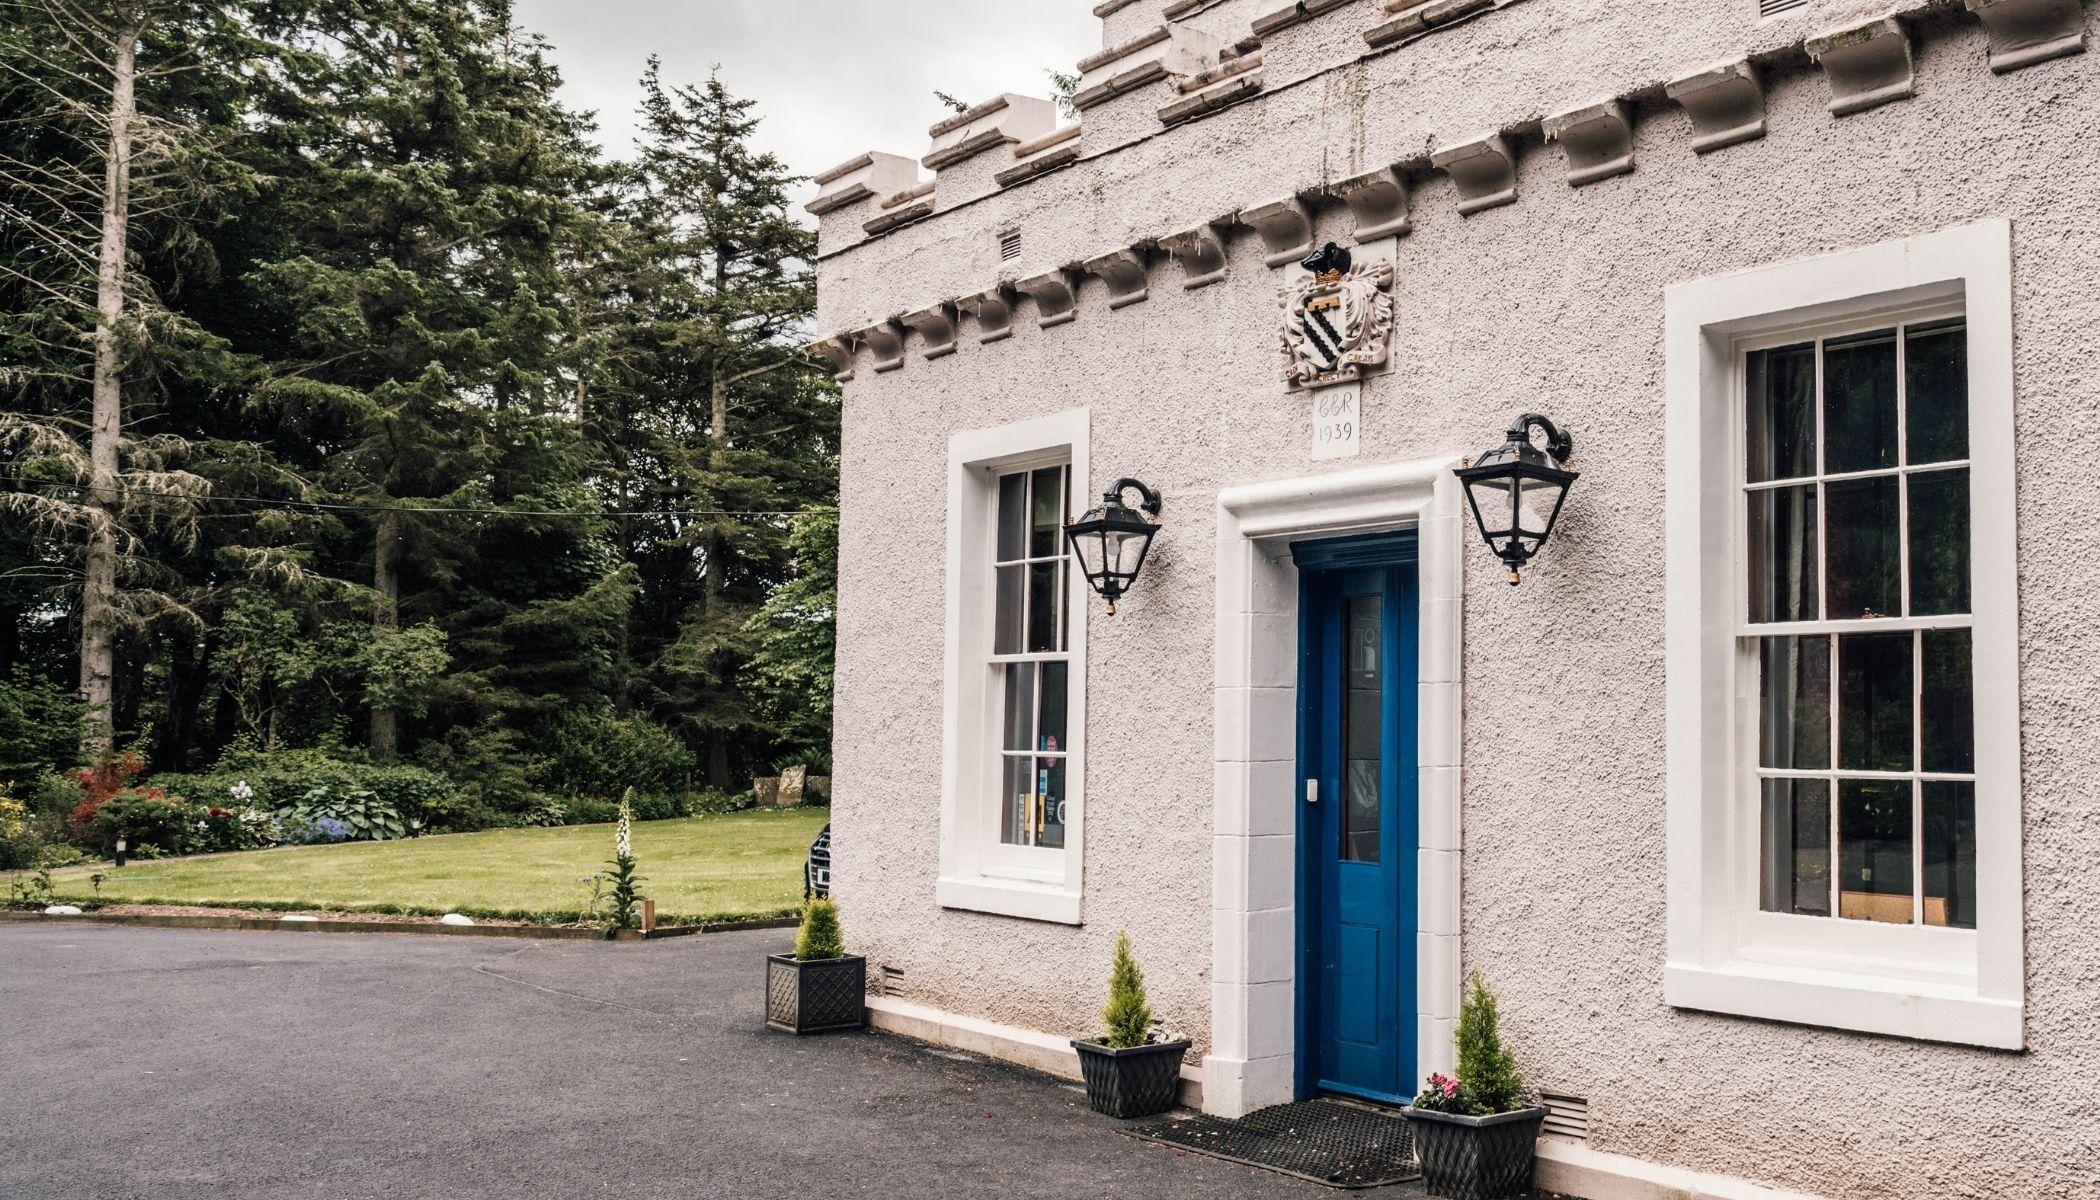 Forss House Hotel in Thurso, Caithness